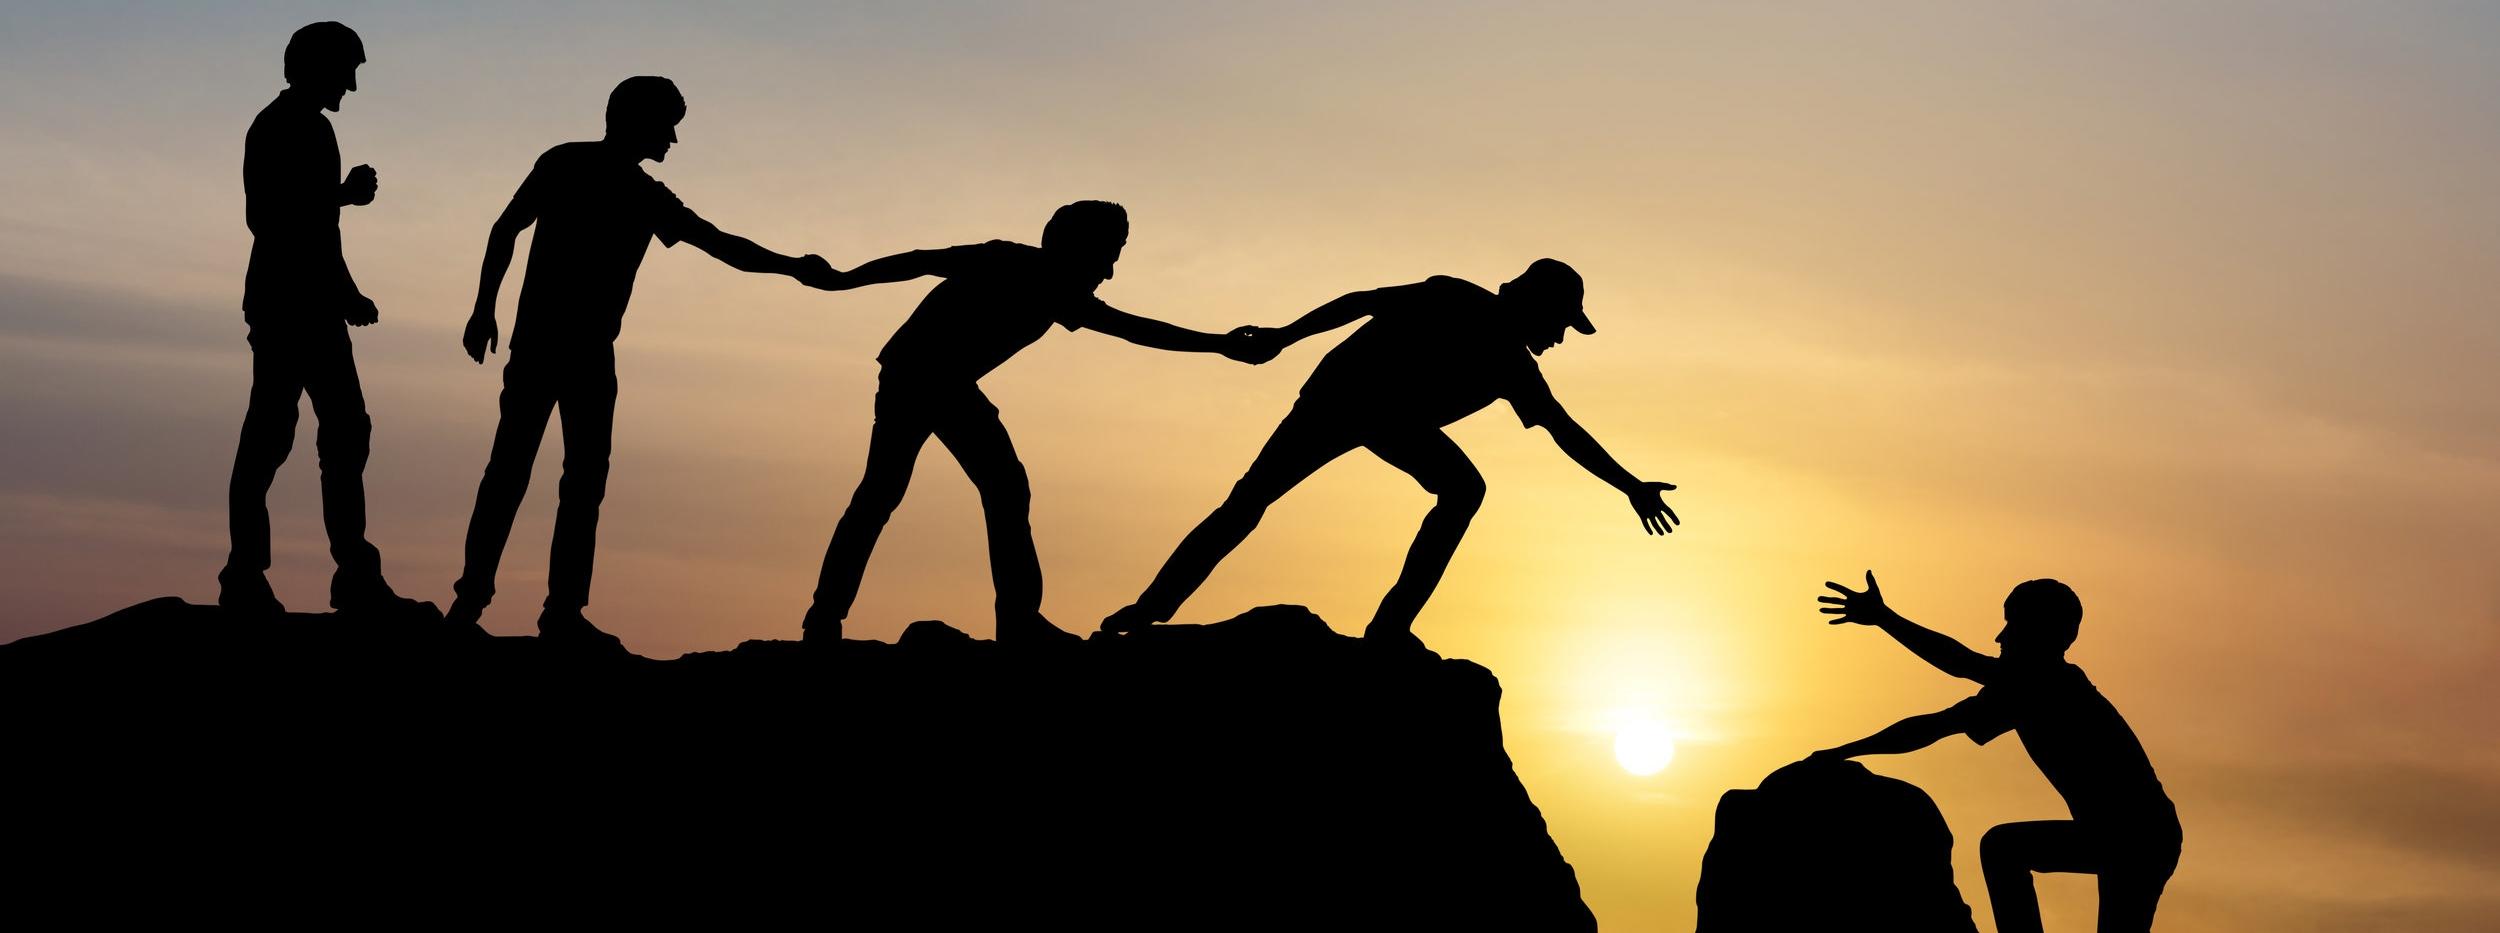 Pride & Love - AMONGST BROTHERS